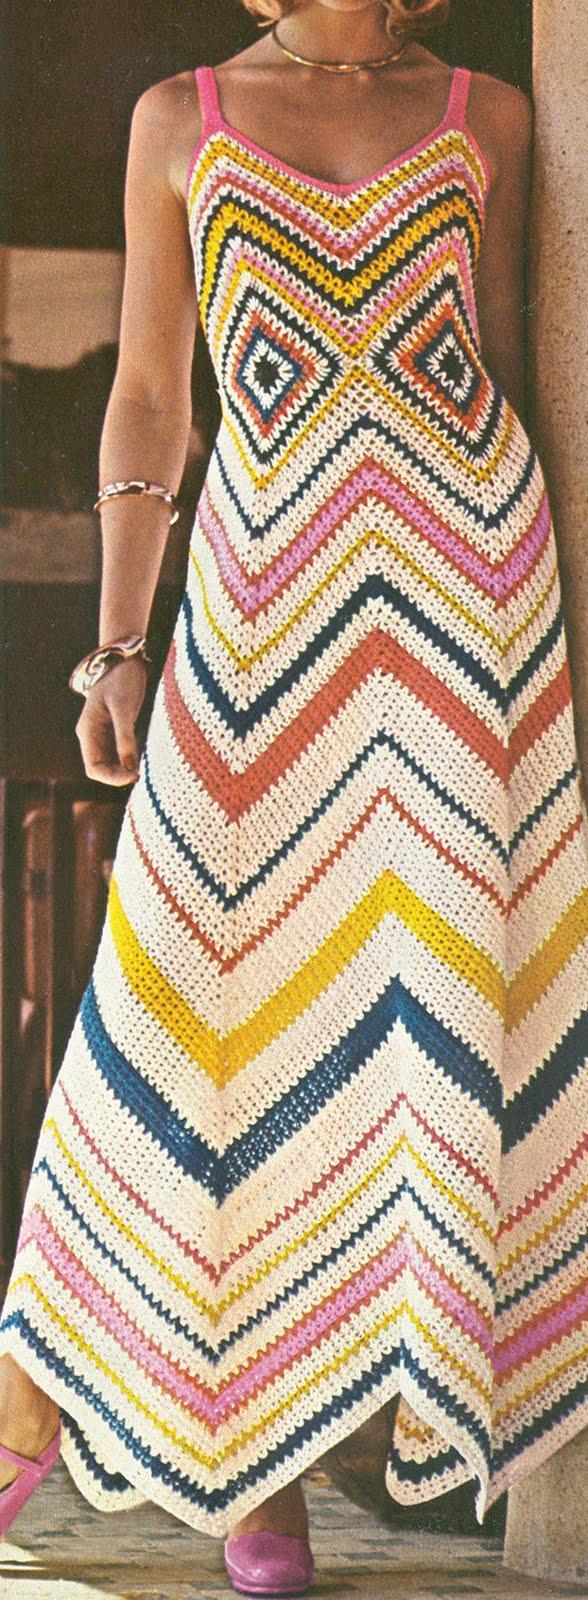 Christening Crochet Dress Free Pattern Vintage Crochet